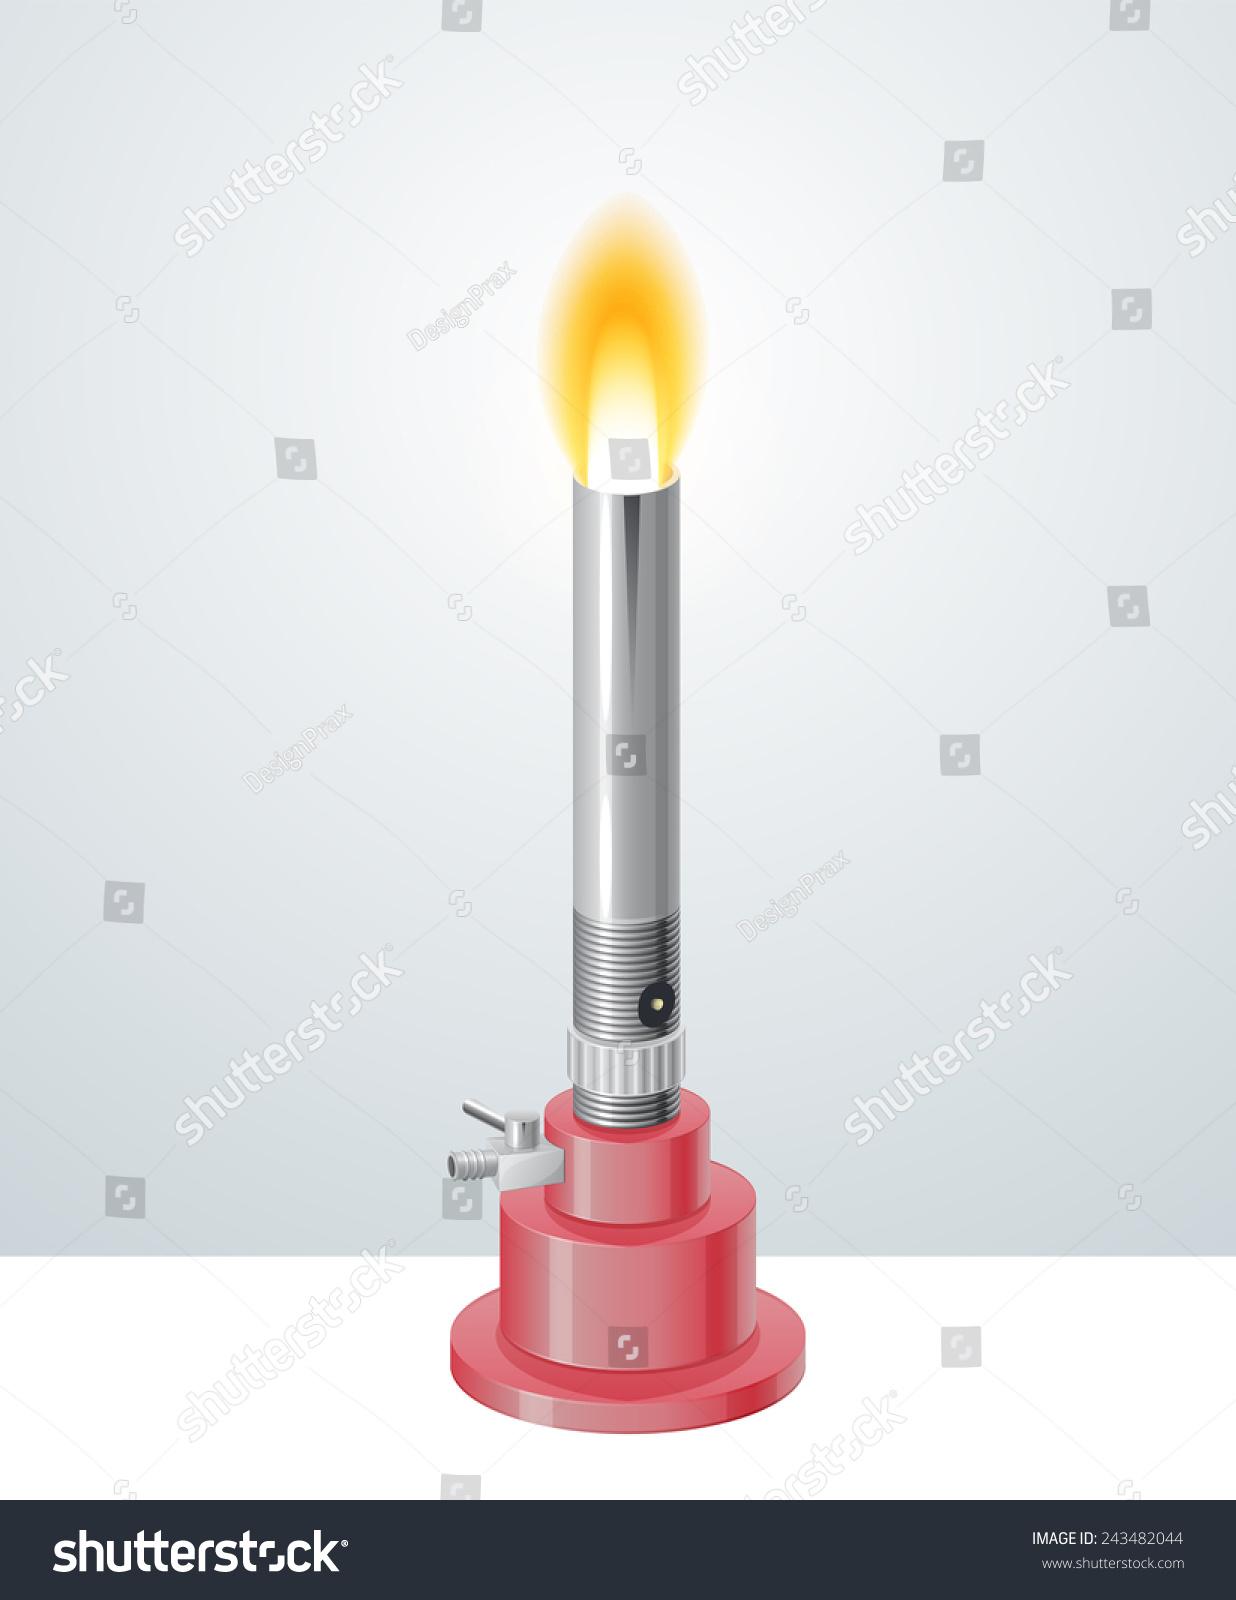 Bunsen burner photo